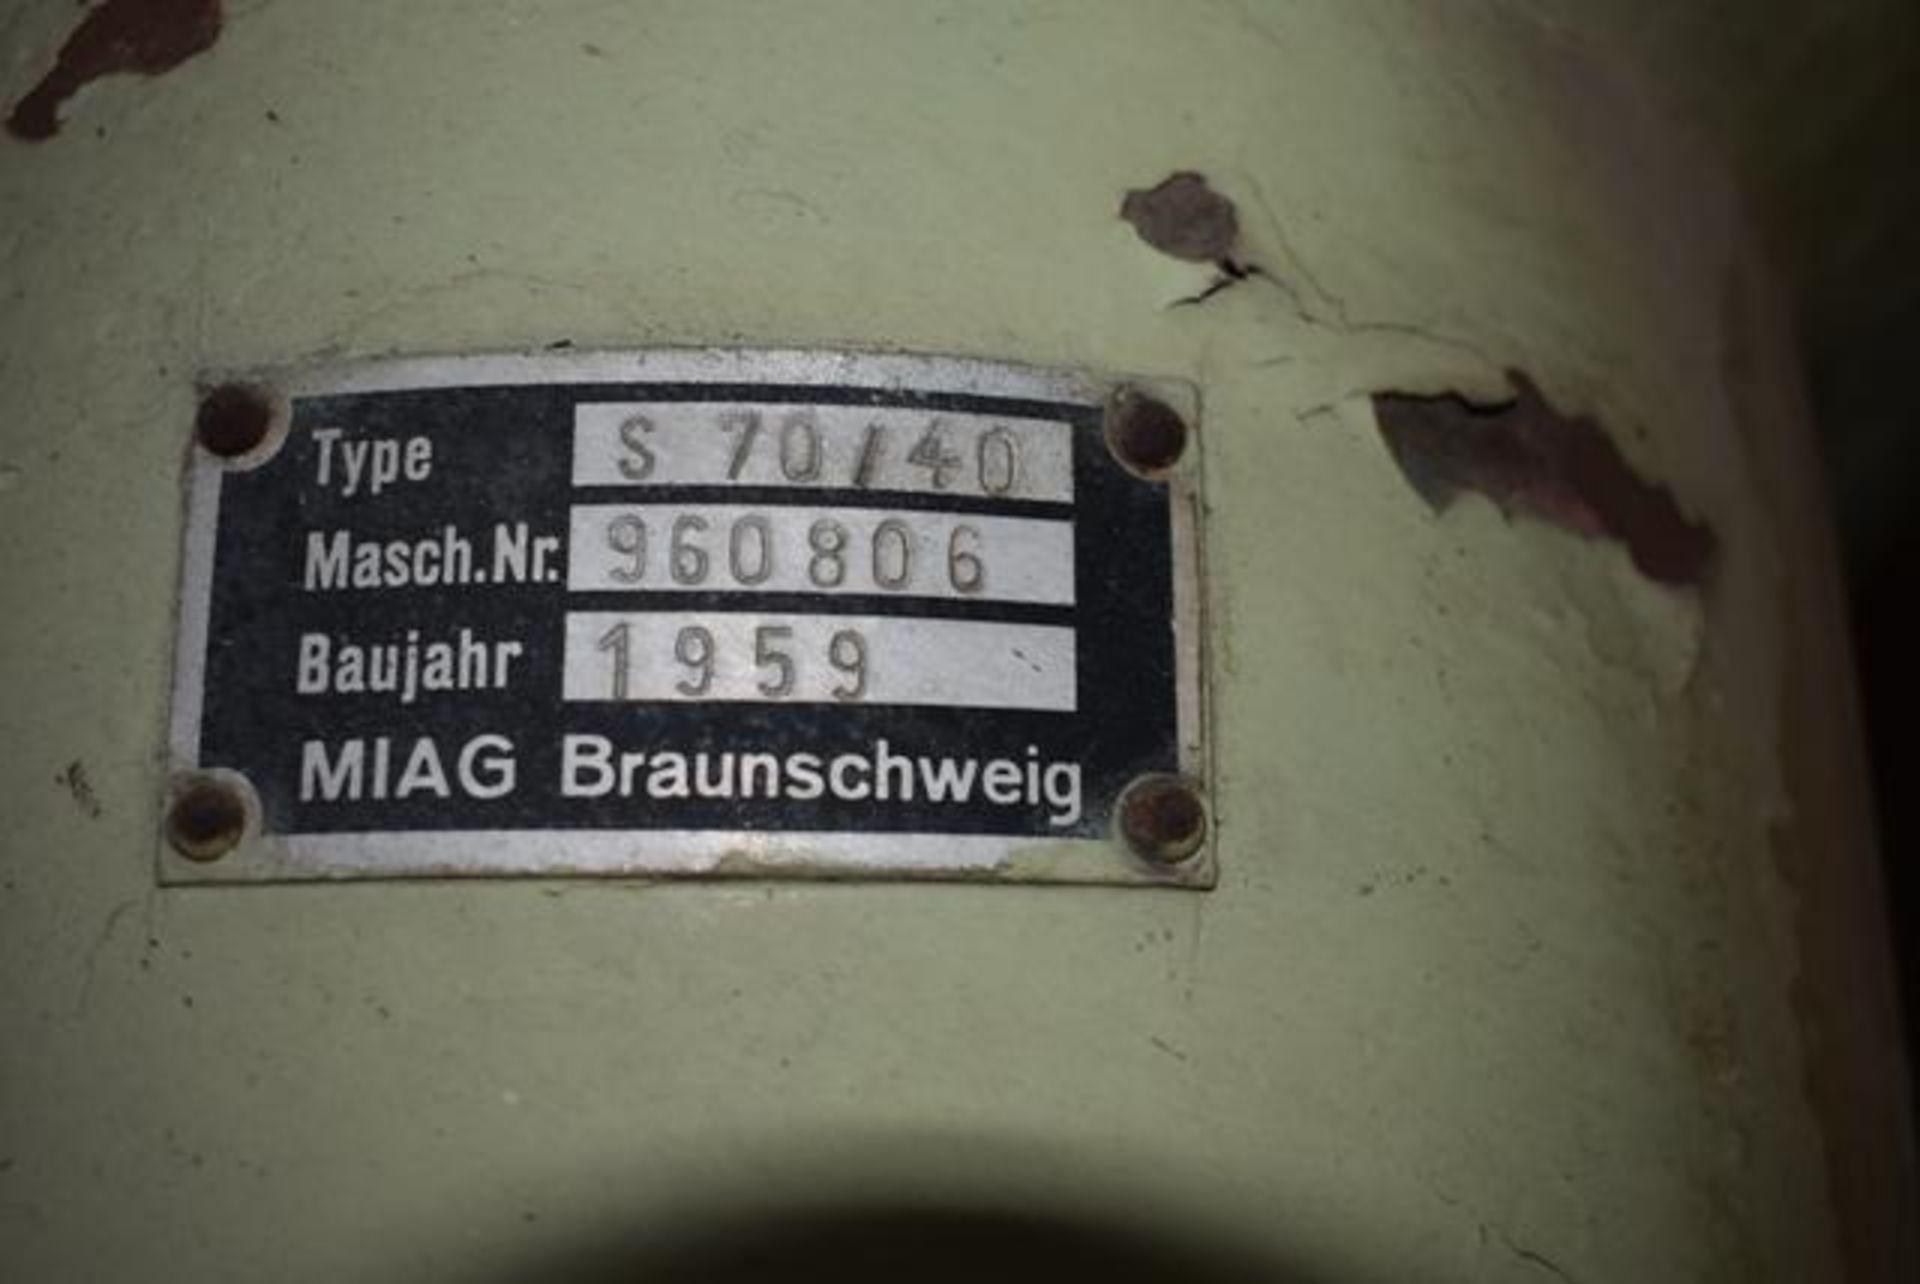 Lot 12 - MIAG Type S70/40 Receiver w/Magnet